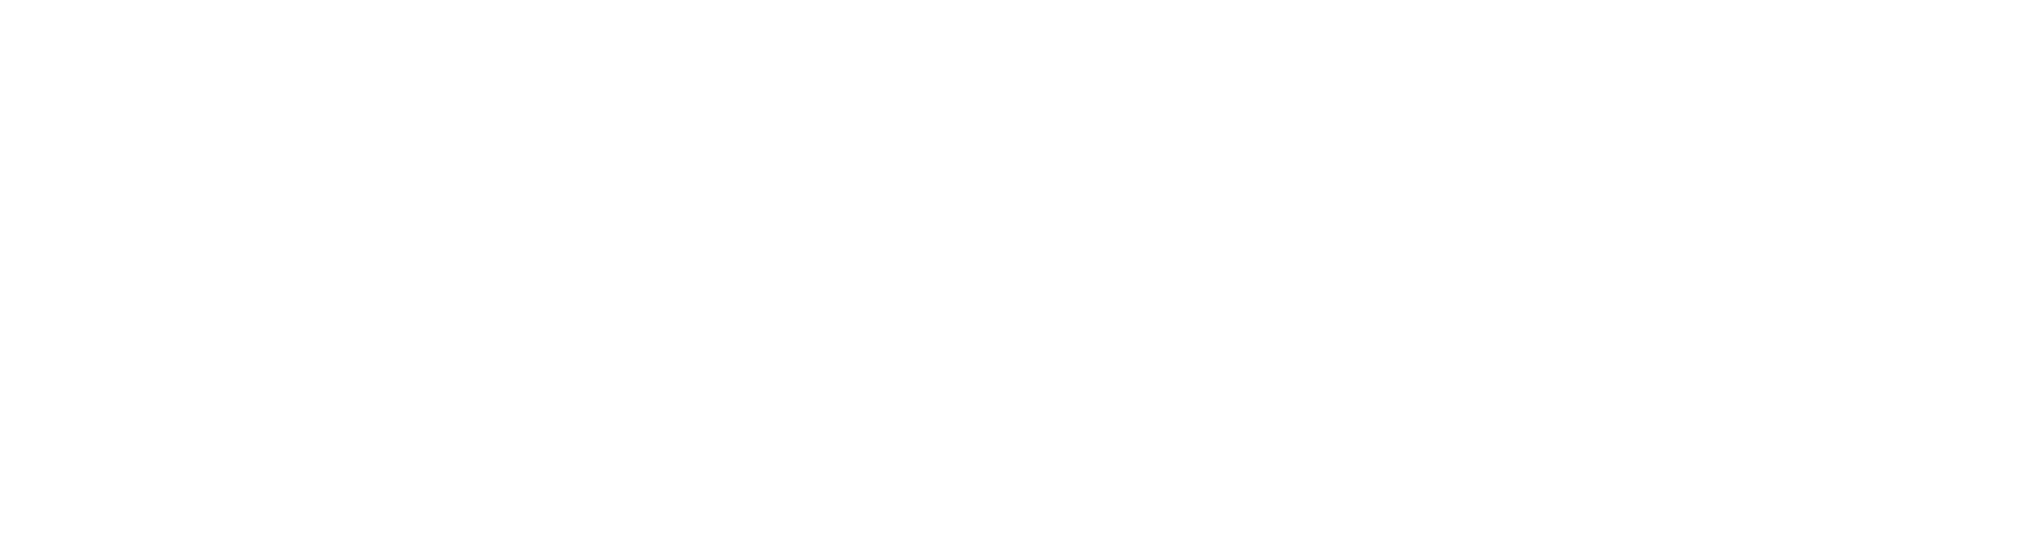 Karamelo